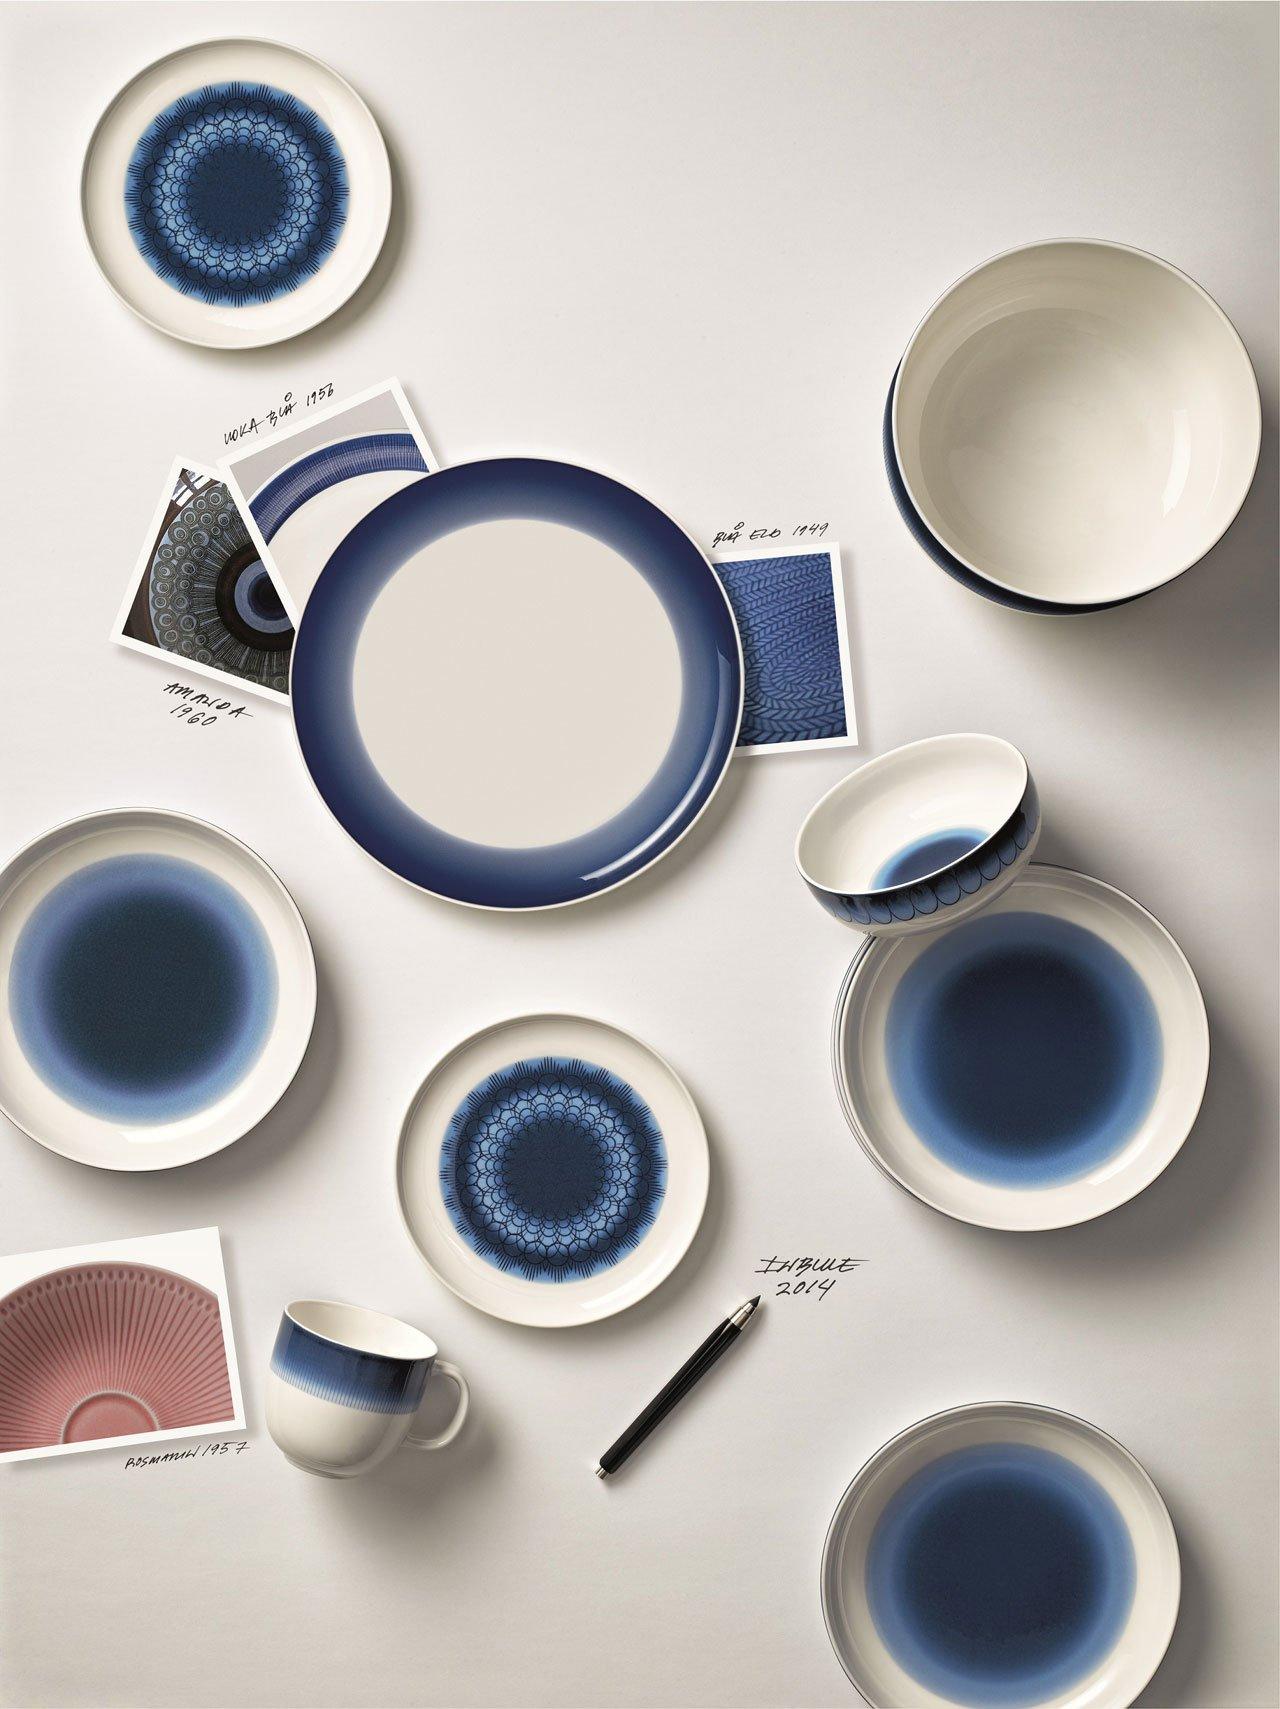 Inblue porcelain tableware byMonica FörsterforRörstrand.